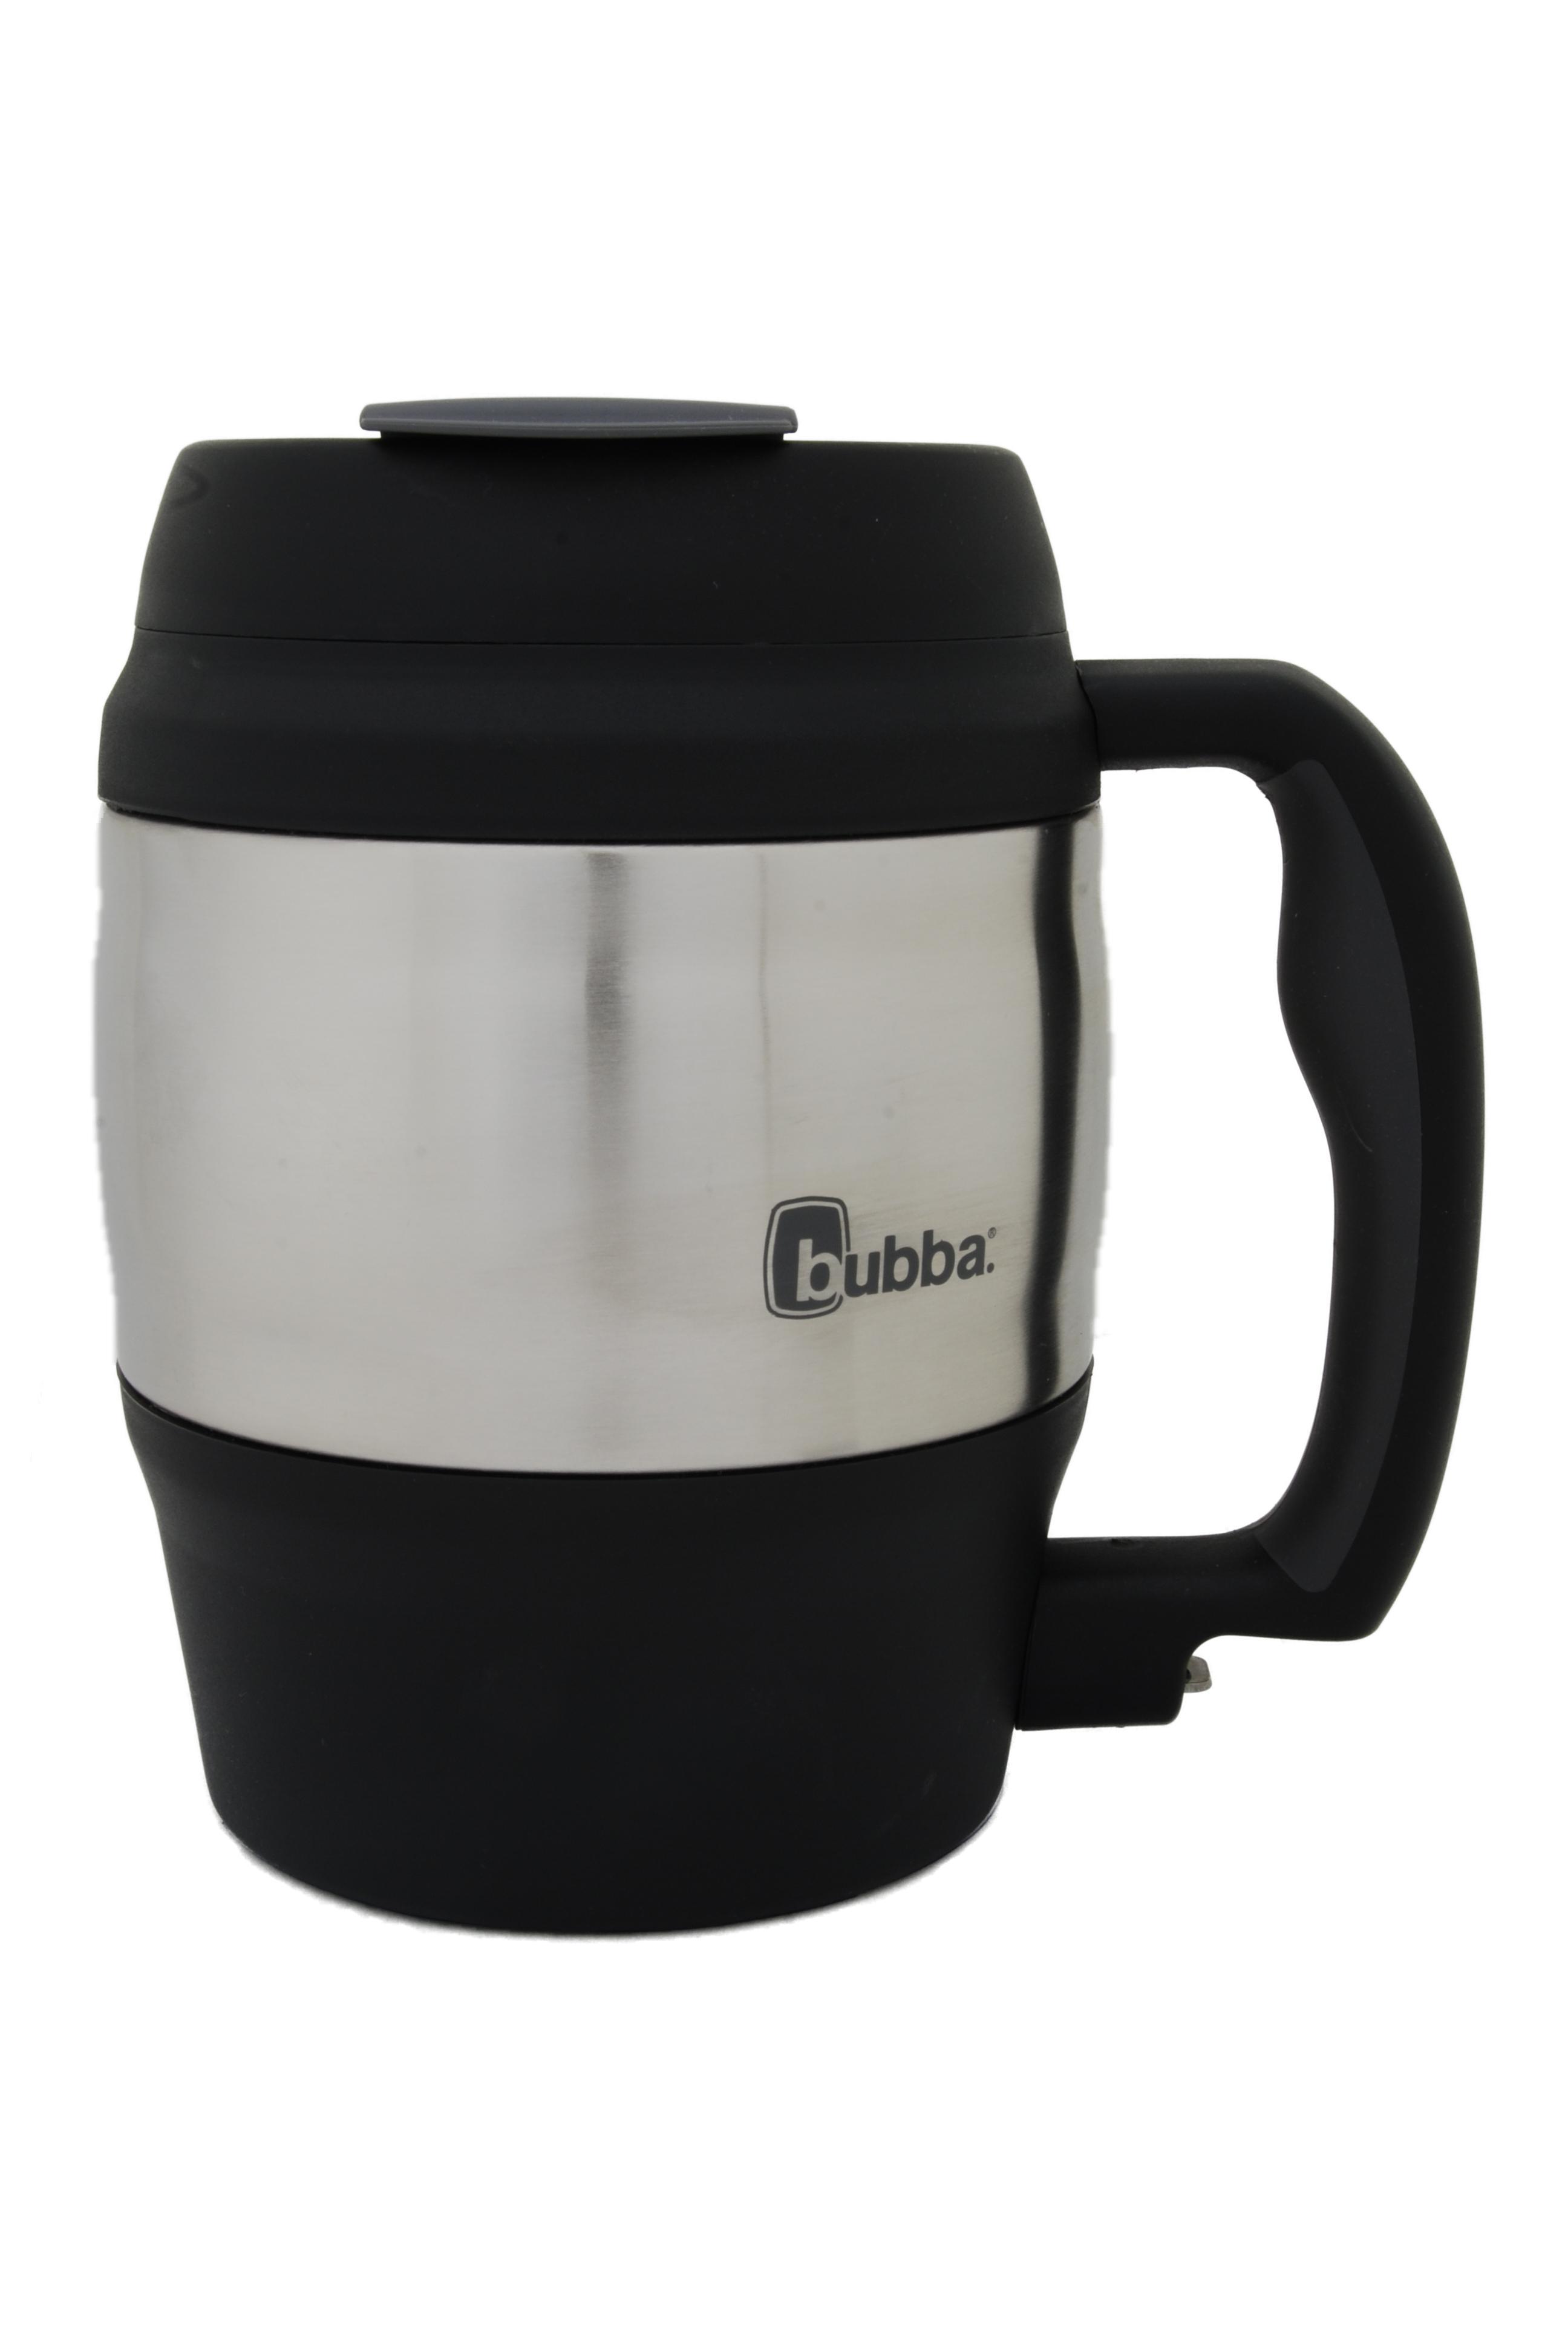 Bubba Keg Coffee Mugs